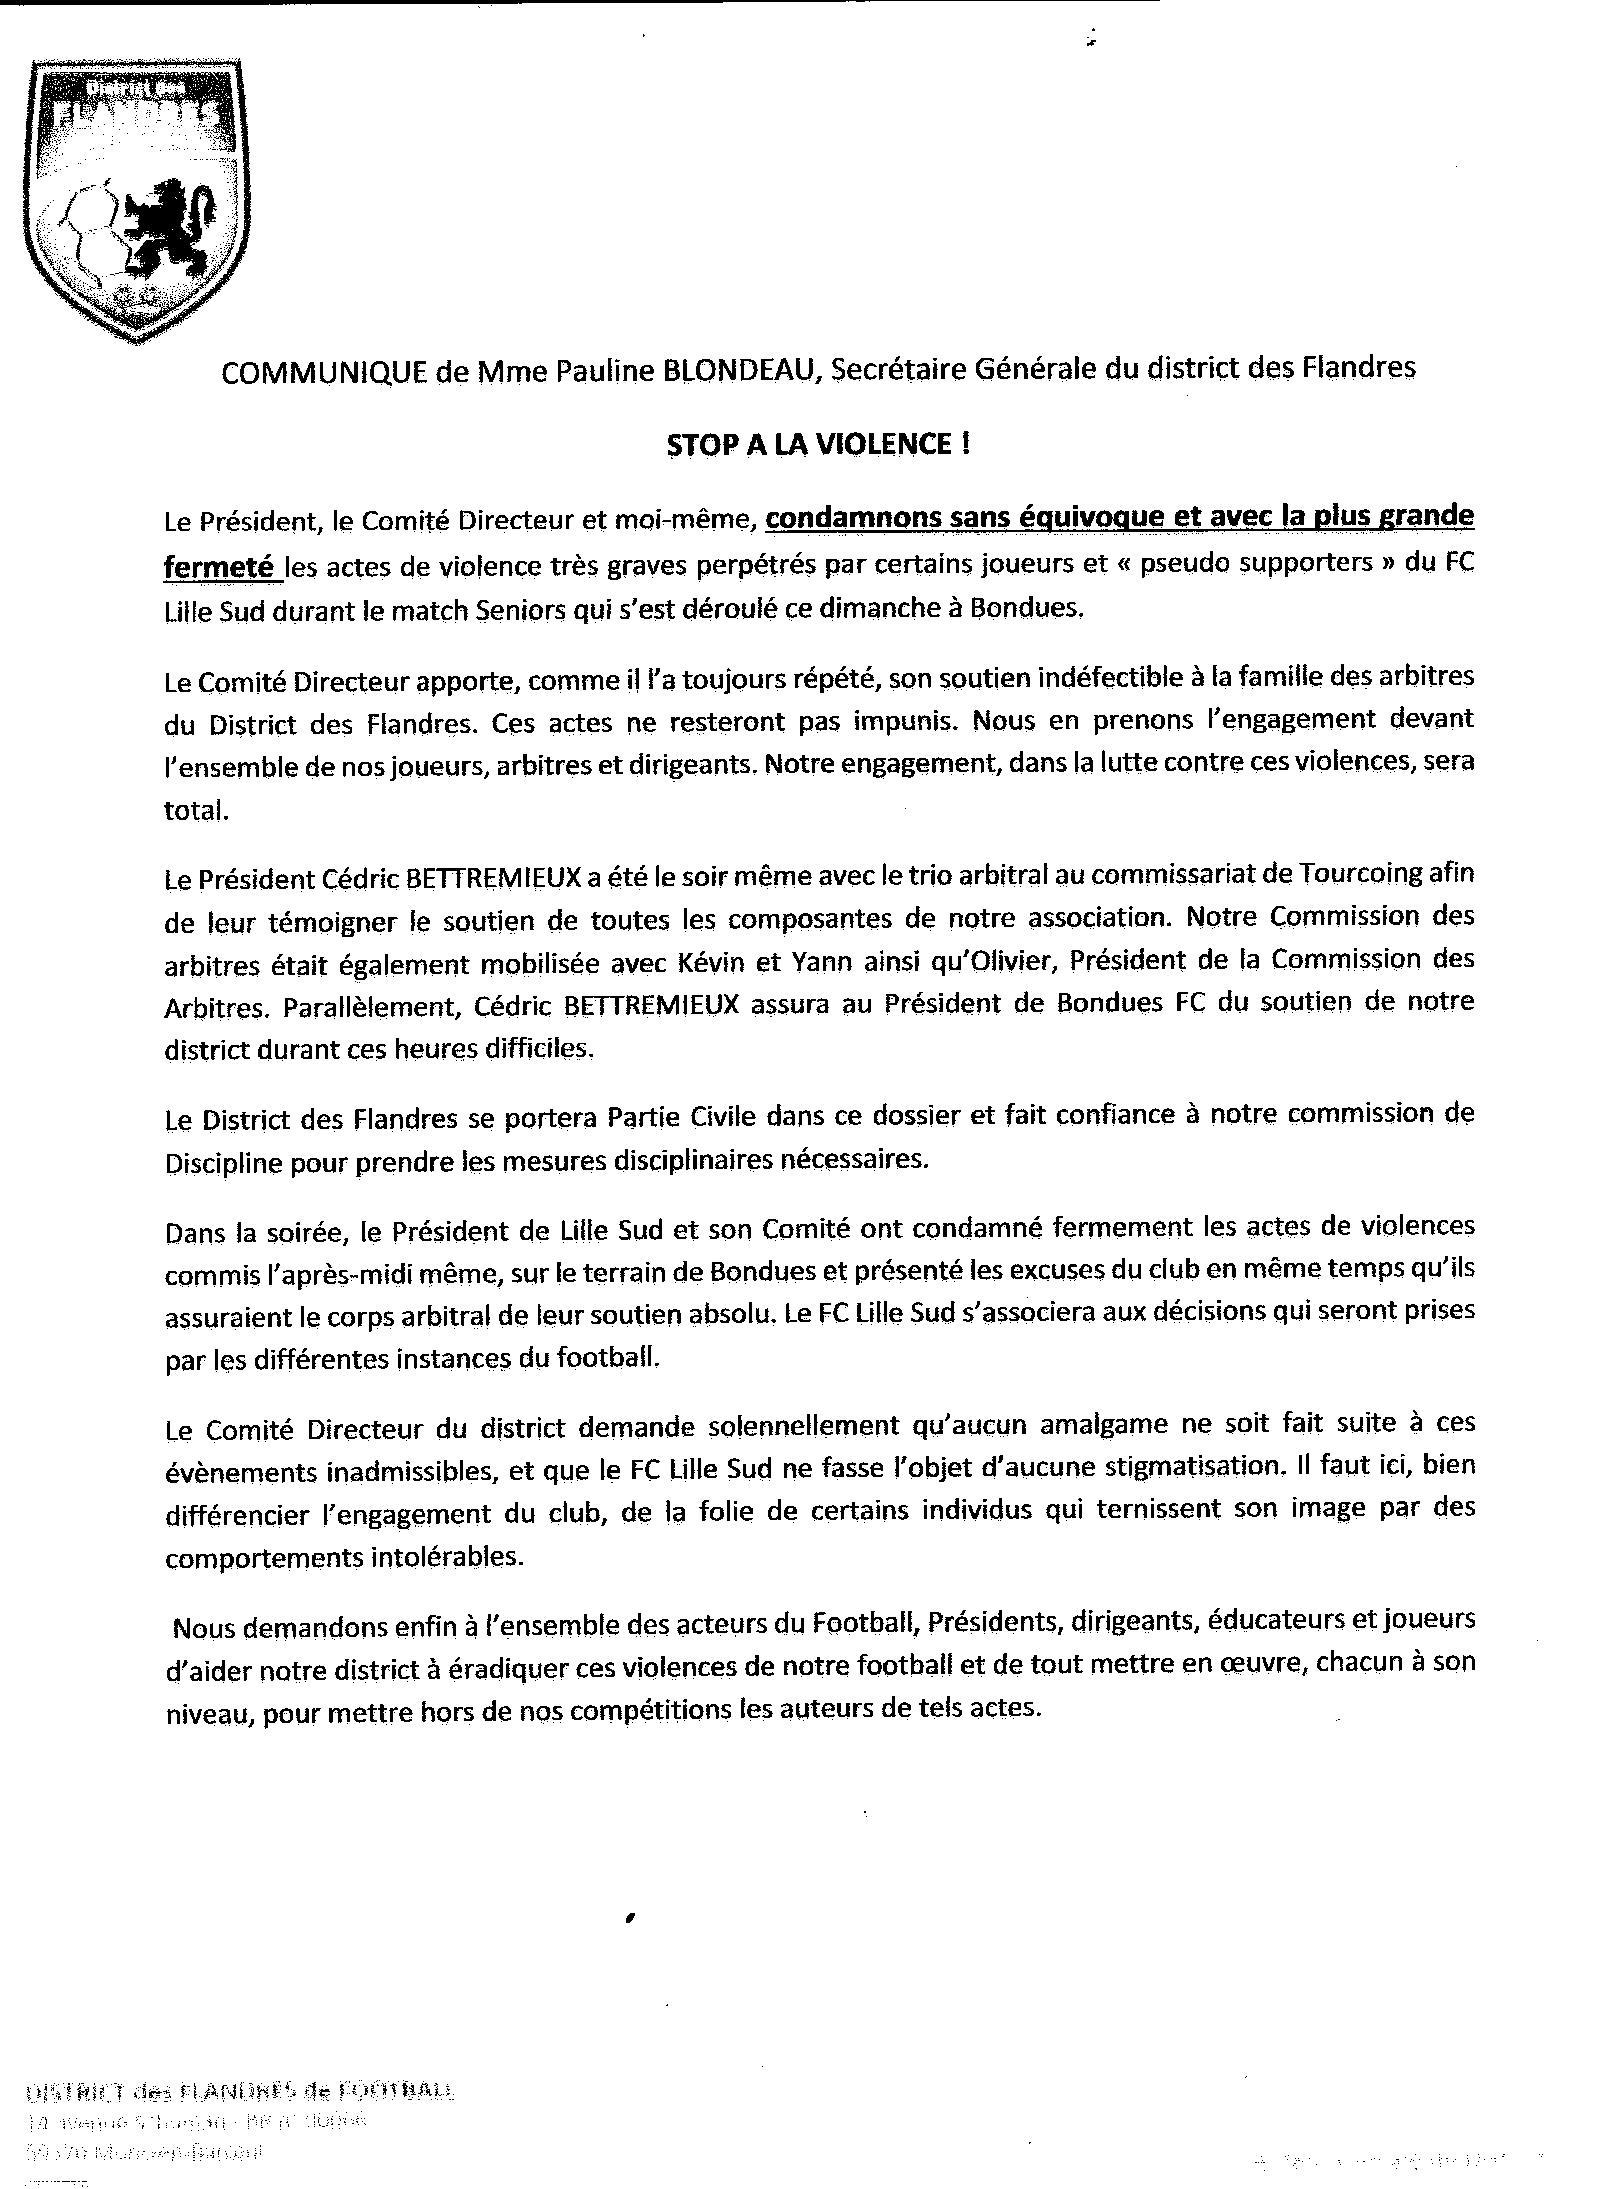 DISTRICT DES FLANDRES STOP A LA VIOLENCE.jpg